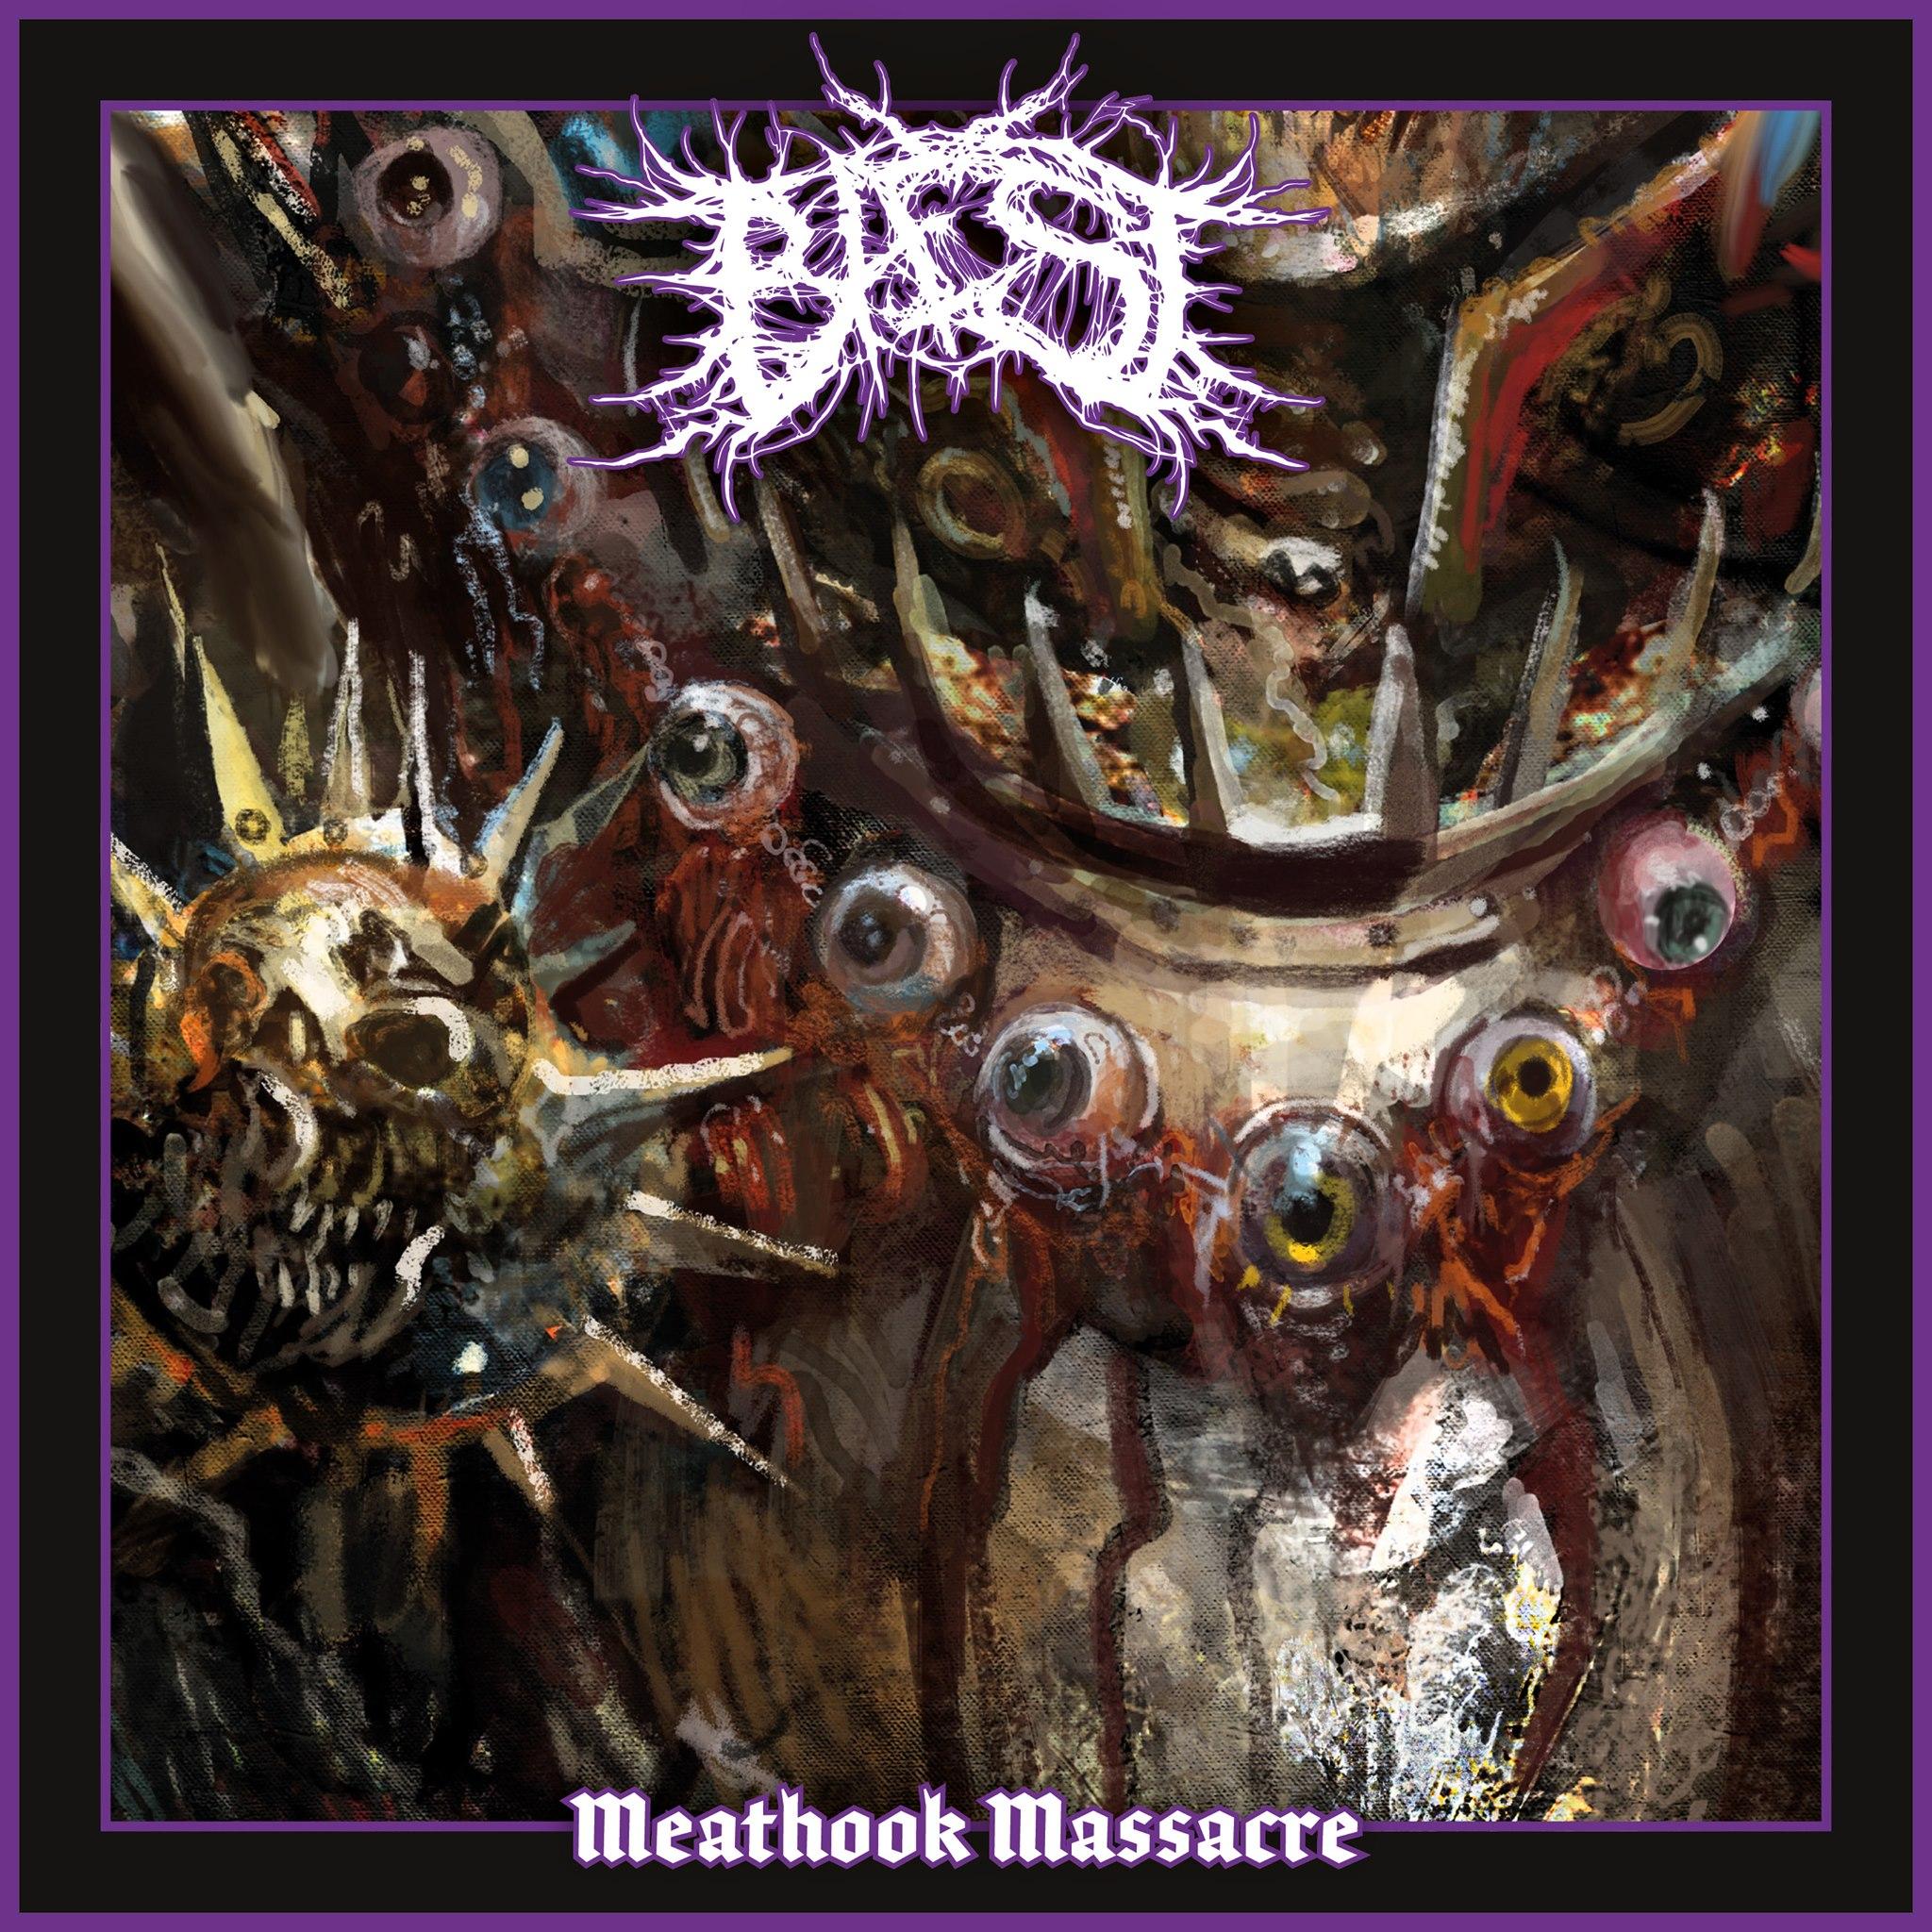 Meathook Massacre Baest Single Cover Artwork